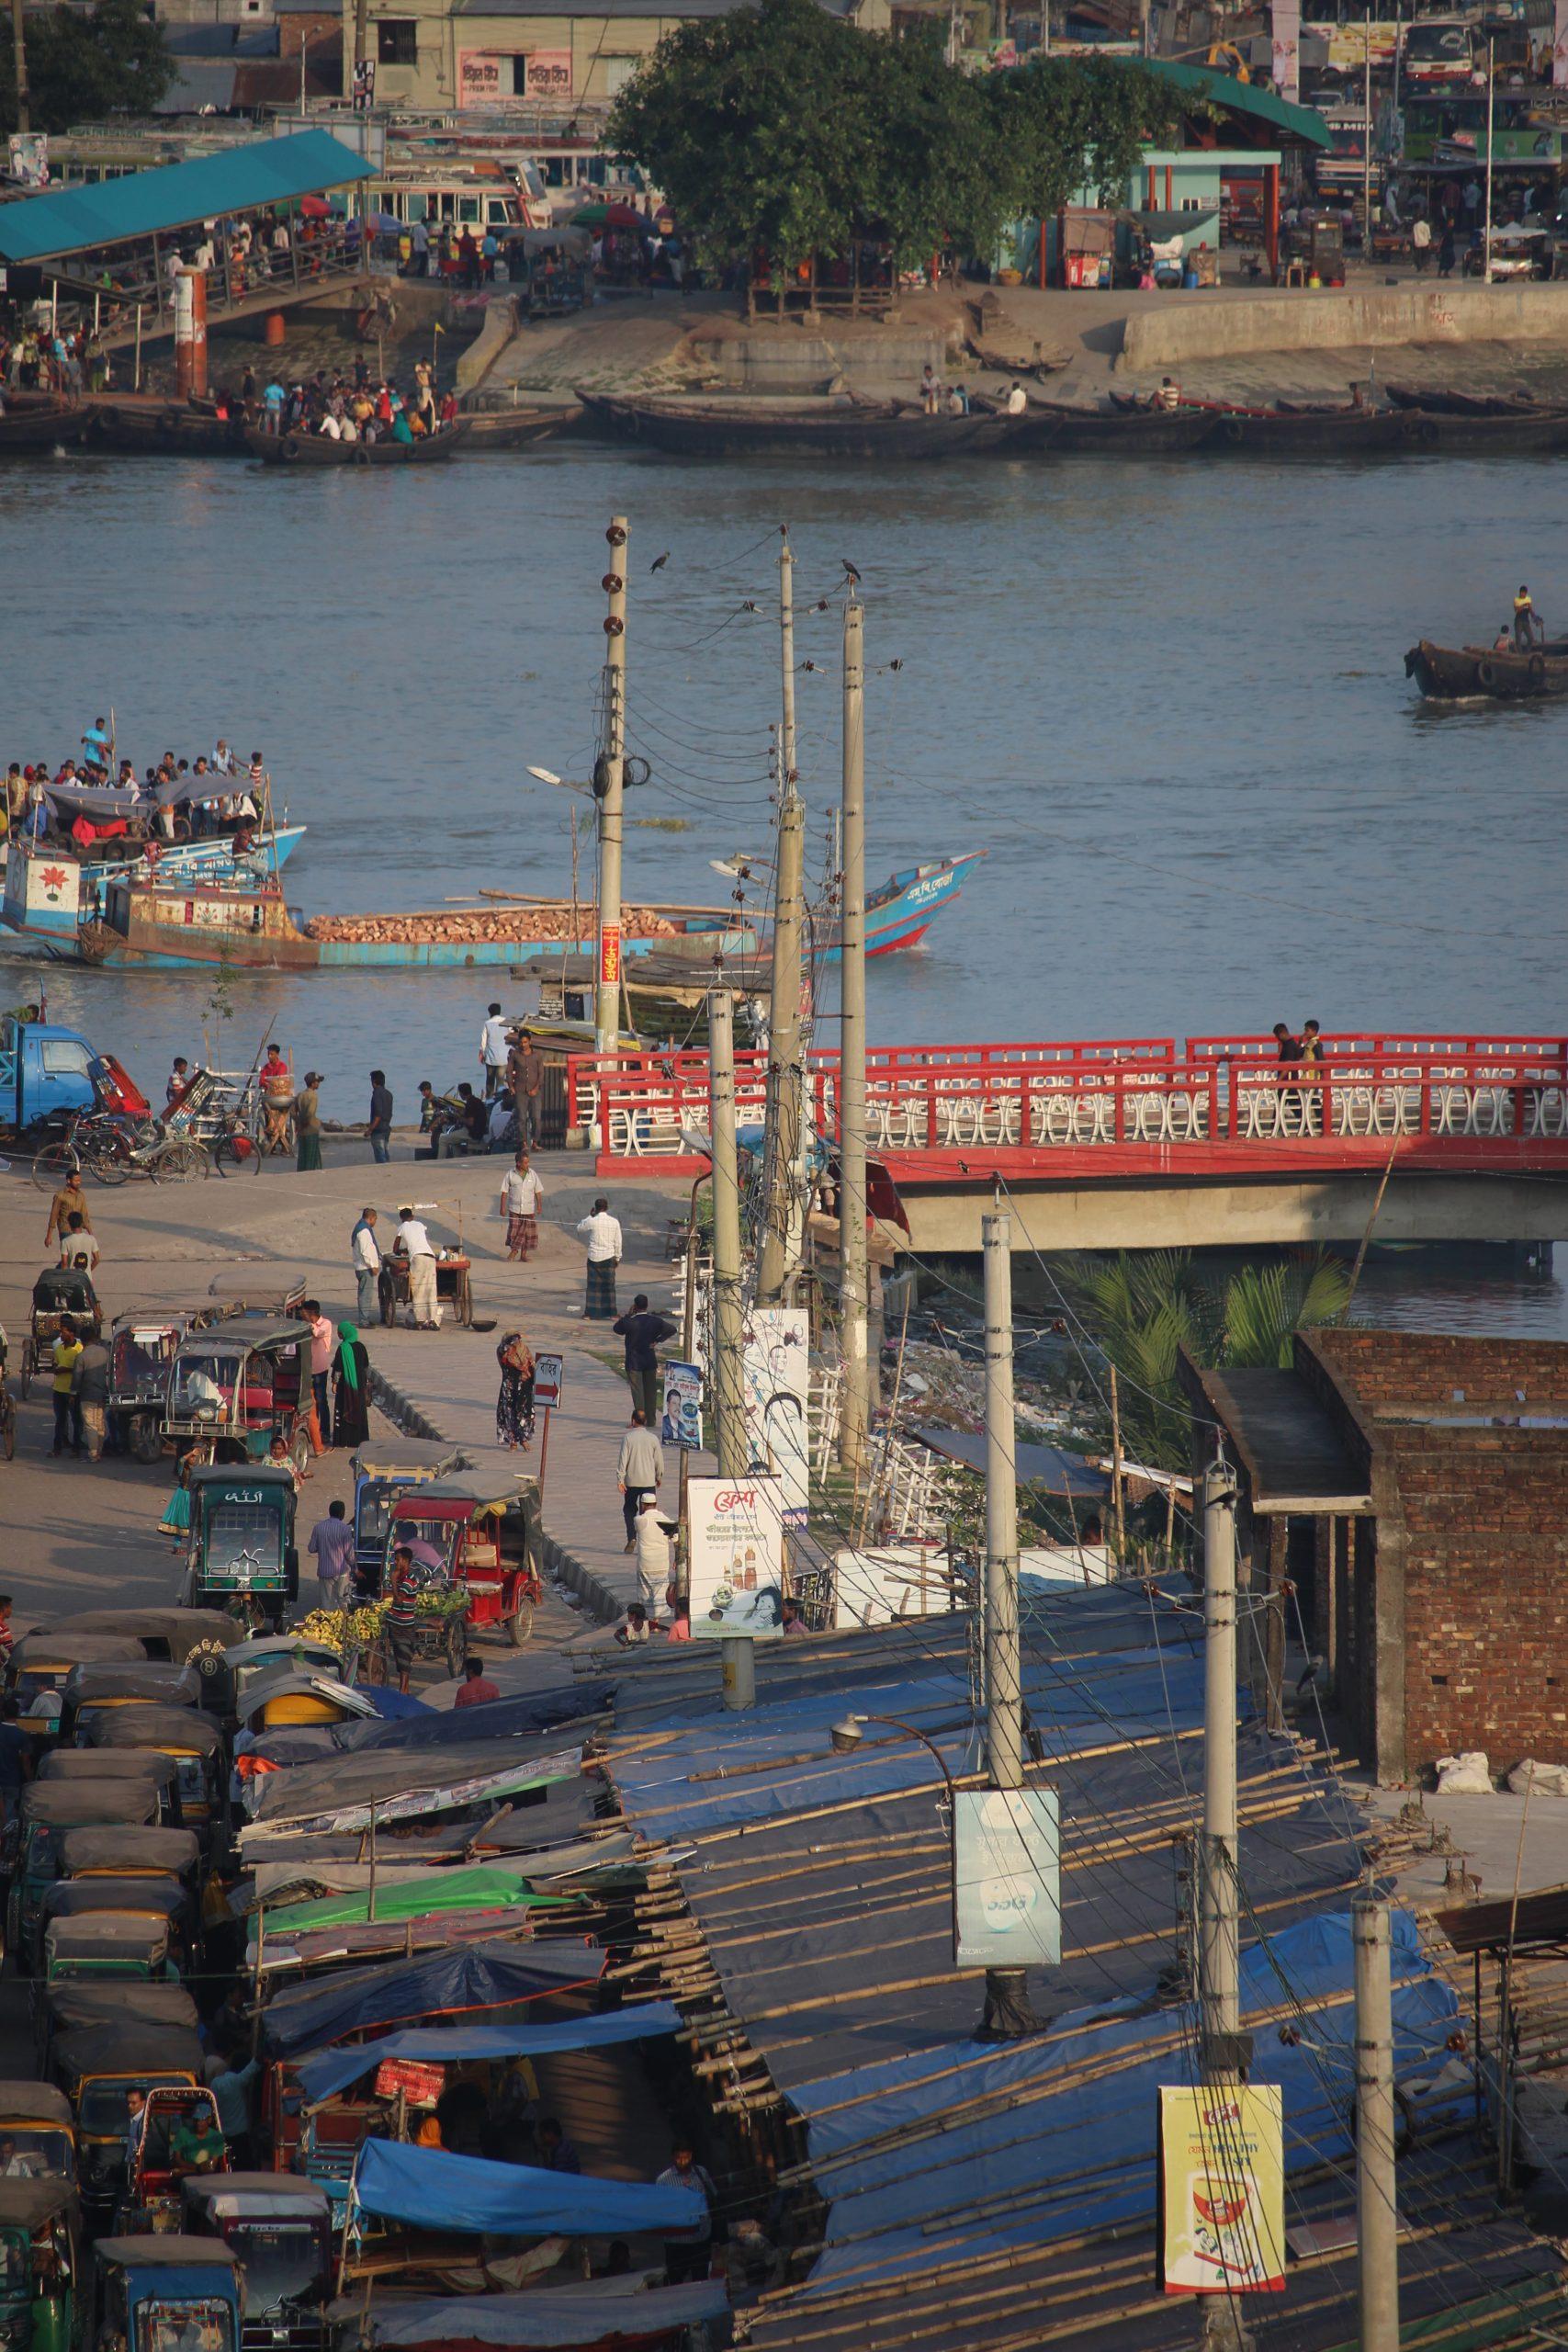 Edge of the city - Rupsa River Ghat, Khulna, Bangladesh. Credit: Irfan Shakil, Khulna University